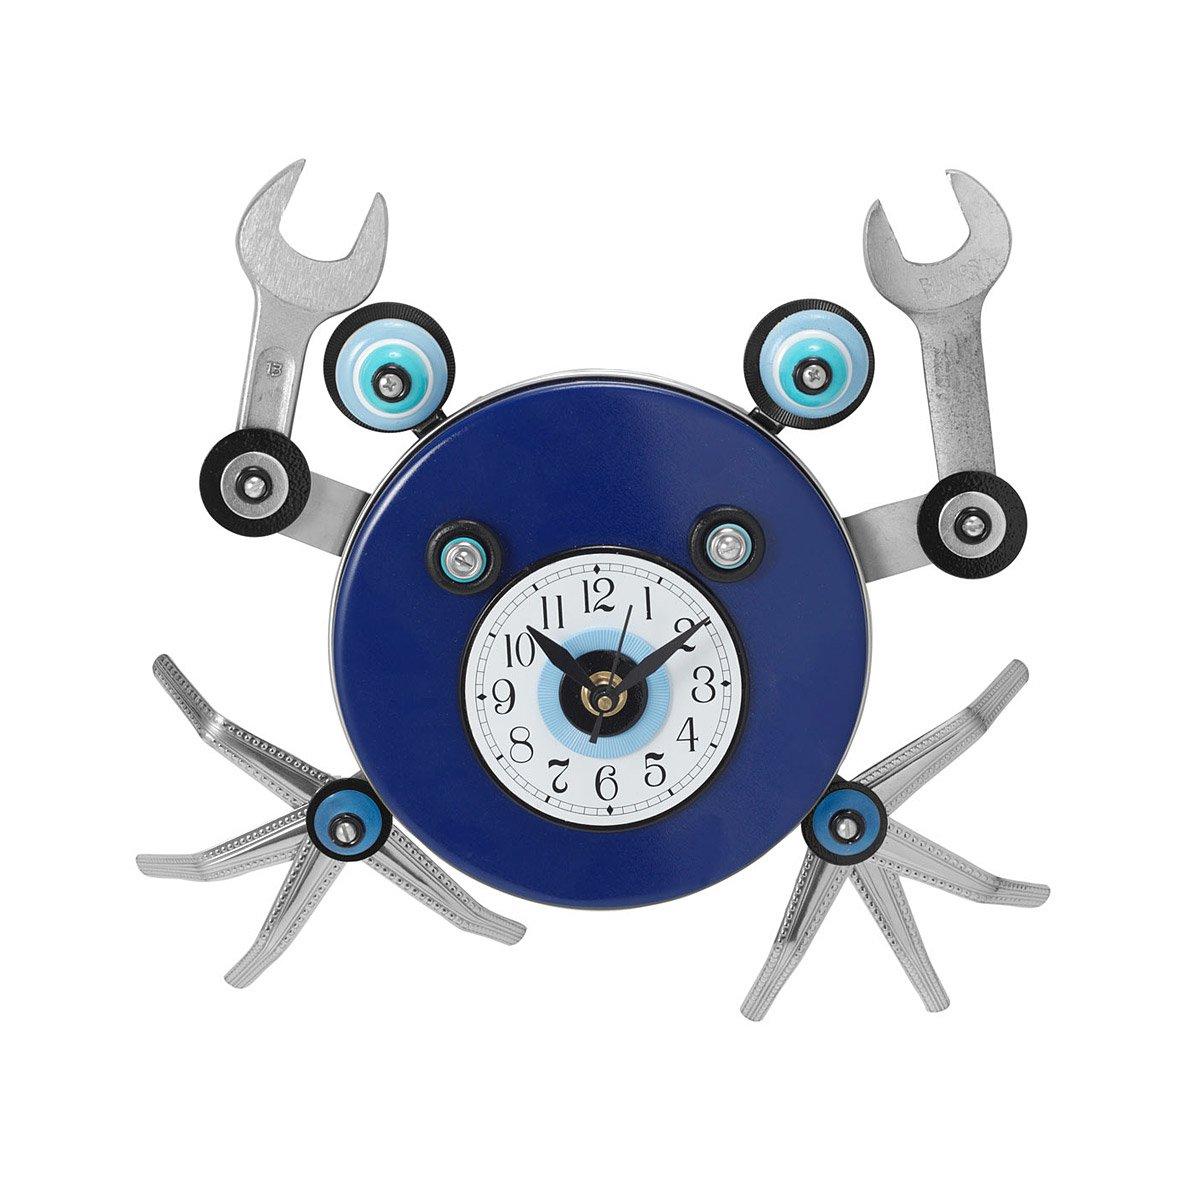 Crab wall clock blue shell crabs clocks by mark brown reclaimed crab wall clock 1 thumbnail amipublicfo Gallery